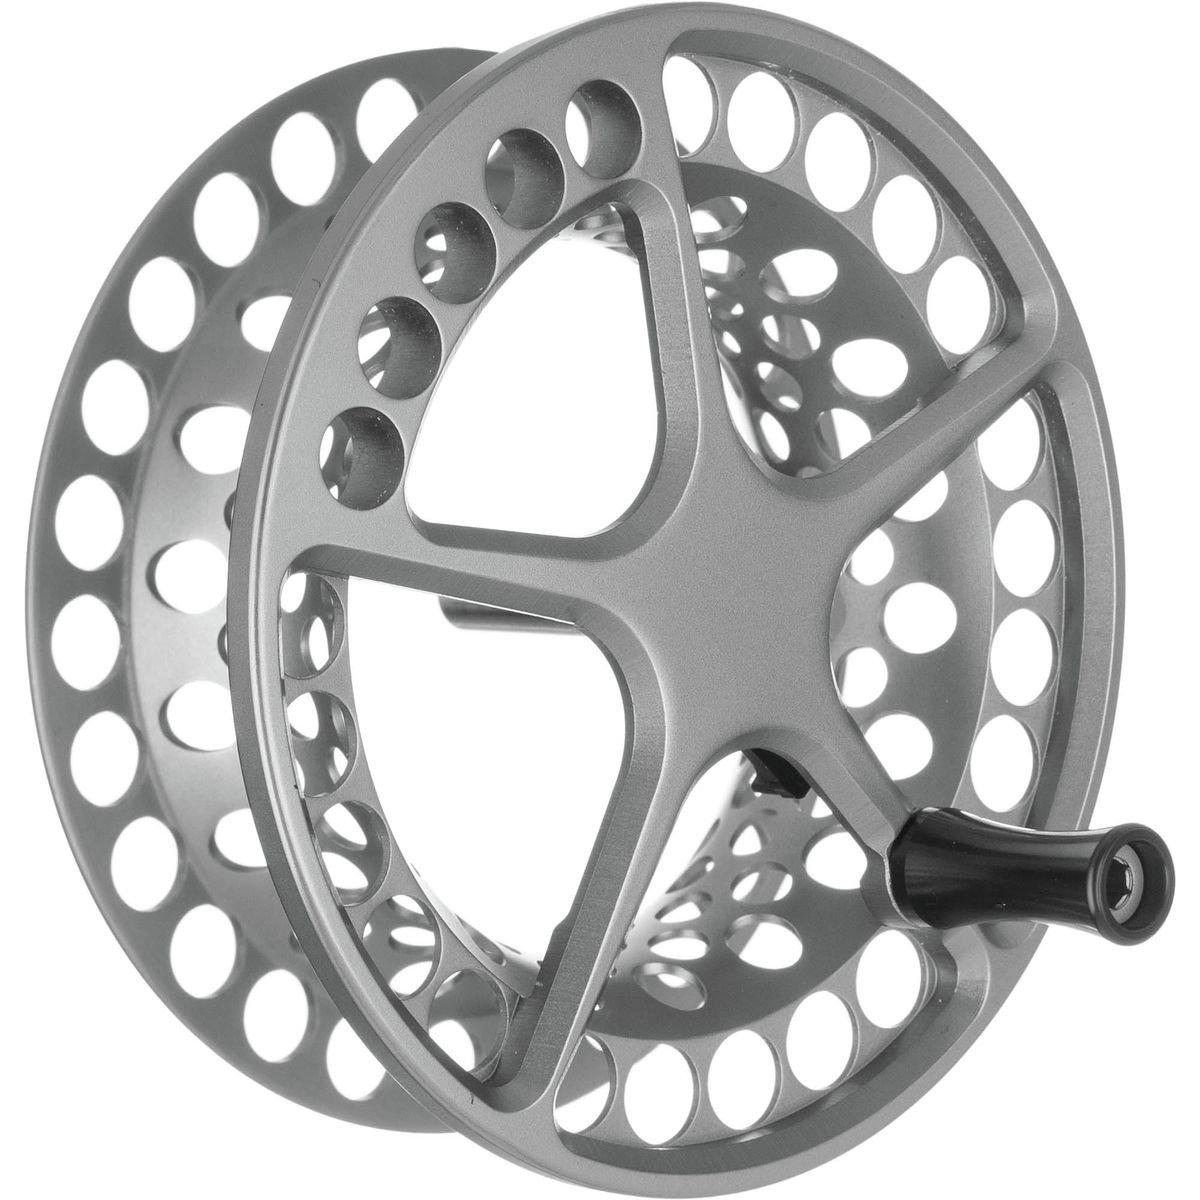 waterworks-lamsonライトスピードMicra 5フライリール B01N63R00E   1.5 (3/4/5 WT) Spare Spool